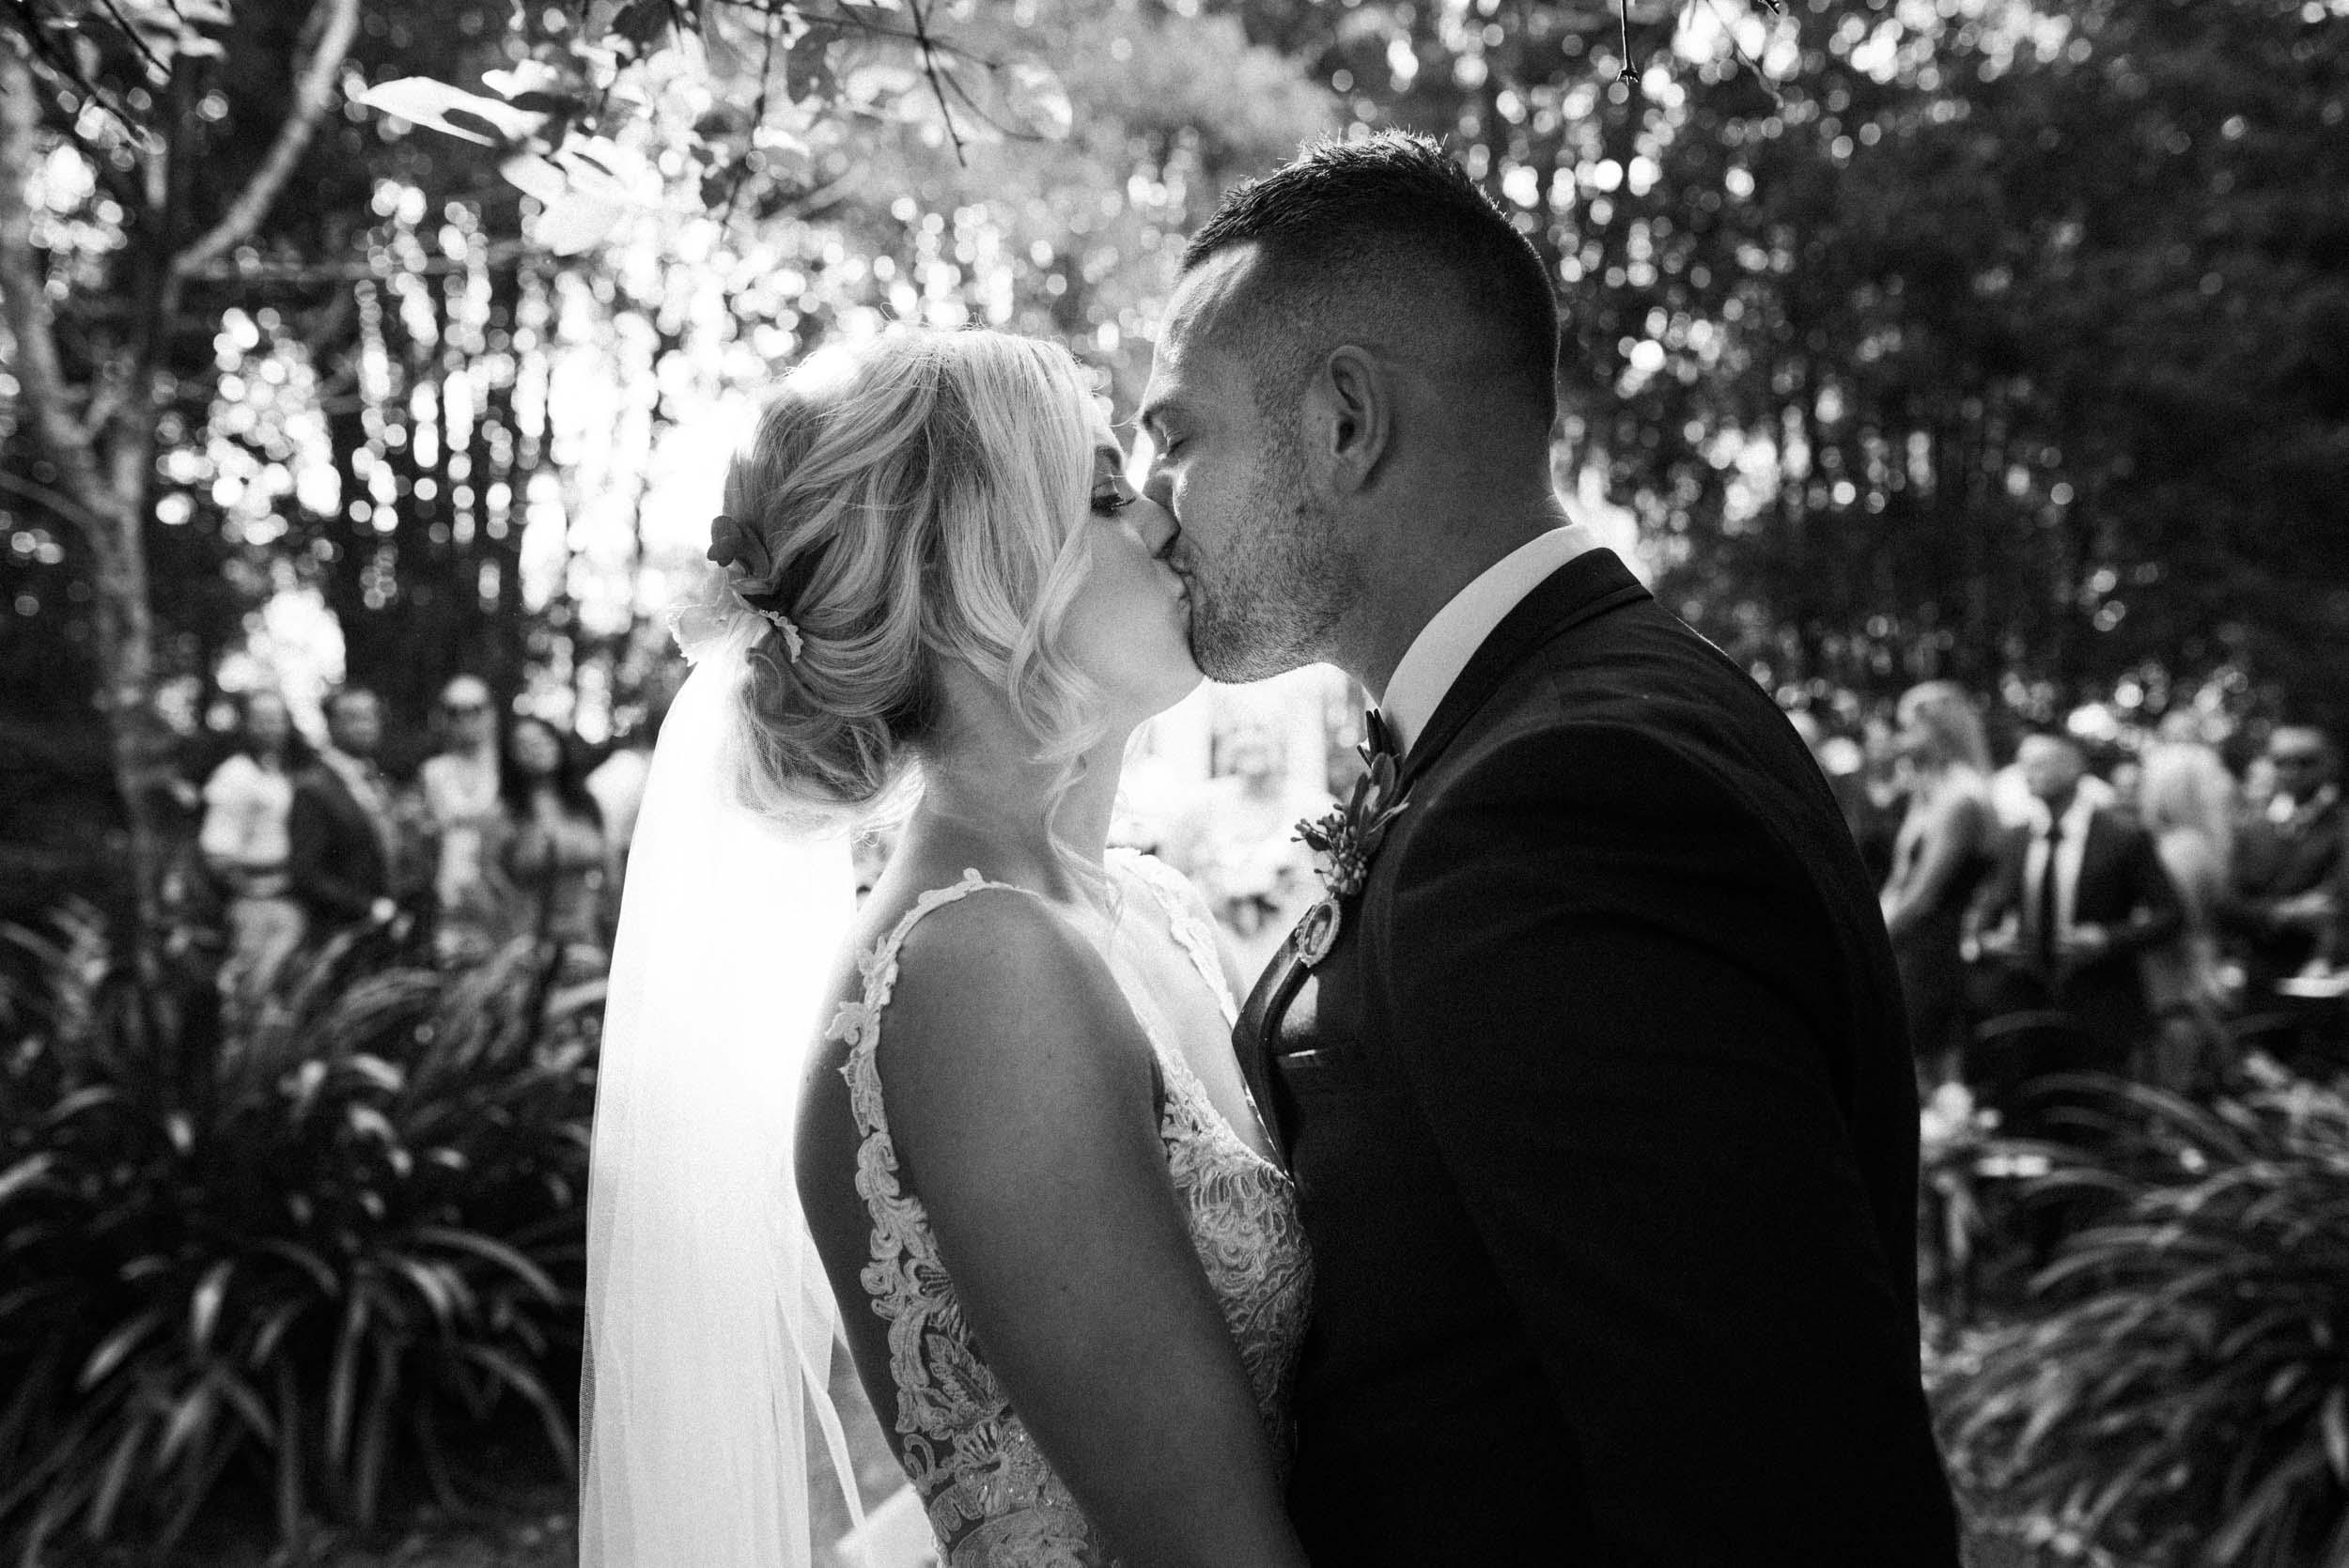 The Raw Photographer - Cairns Wedding Photographer - Laloli - Cairns Garden Wedding - Bride Dress - Destination Wed - Outdoor Reception - Queensland Ceremony-34.jpg